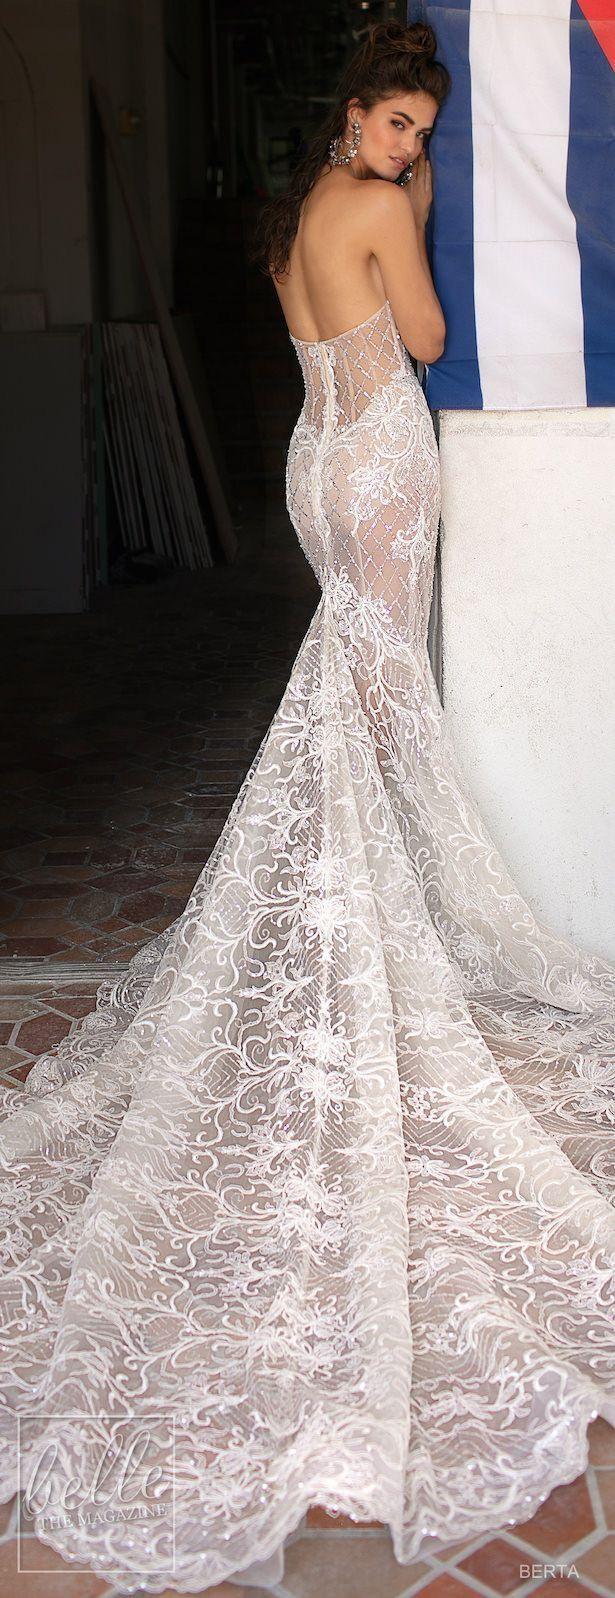 Berta Spring 2019 Wedding Dress Miami Bridal Collection